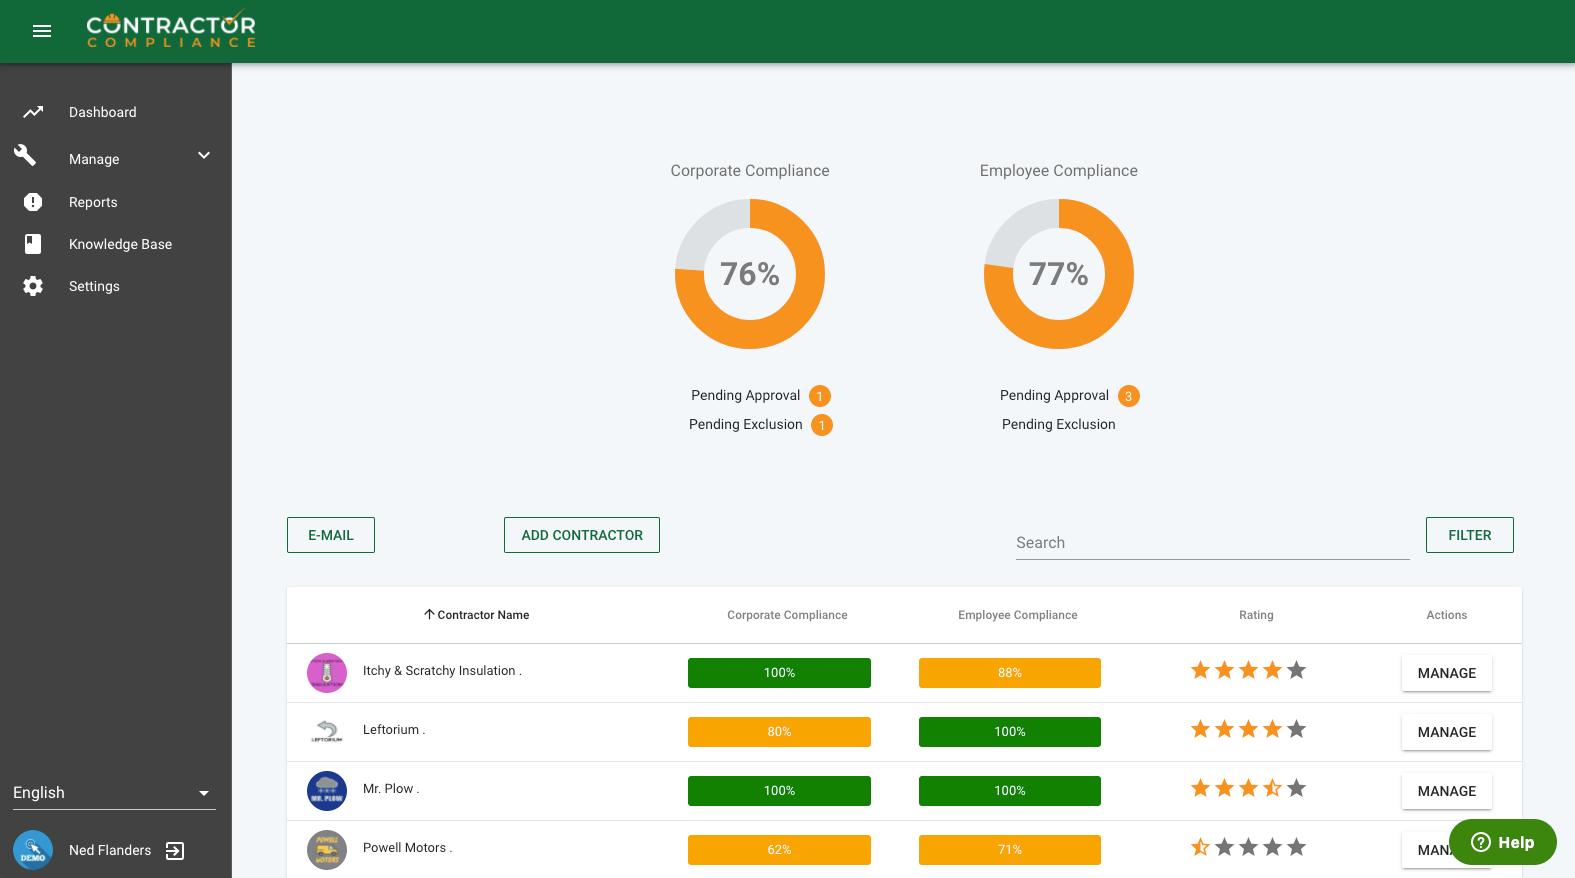 Dashboard to view key compliance metrics.